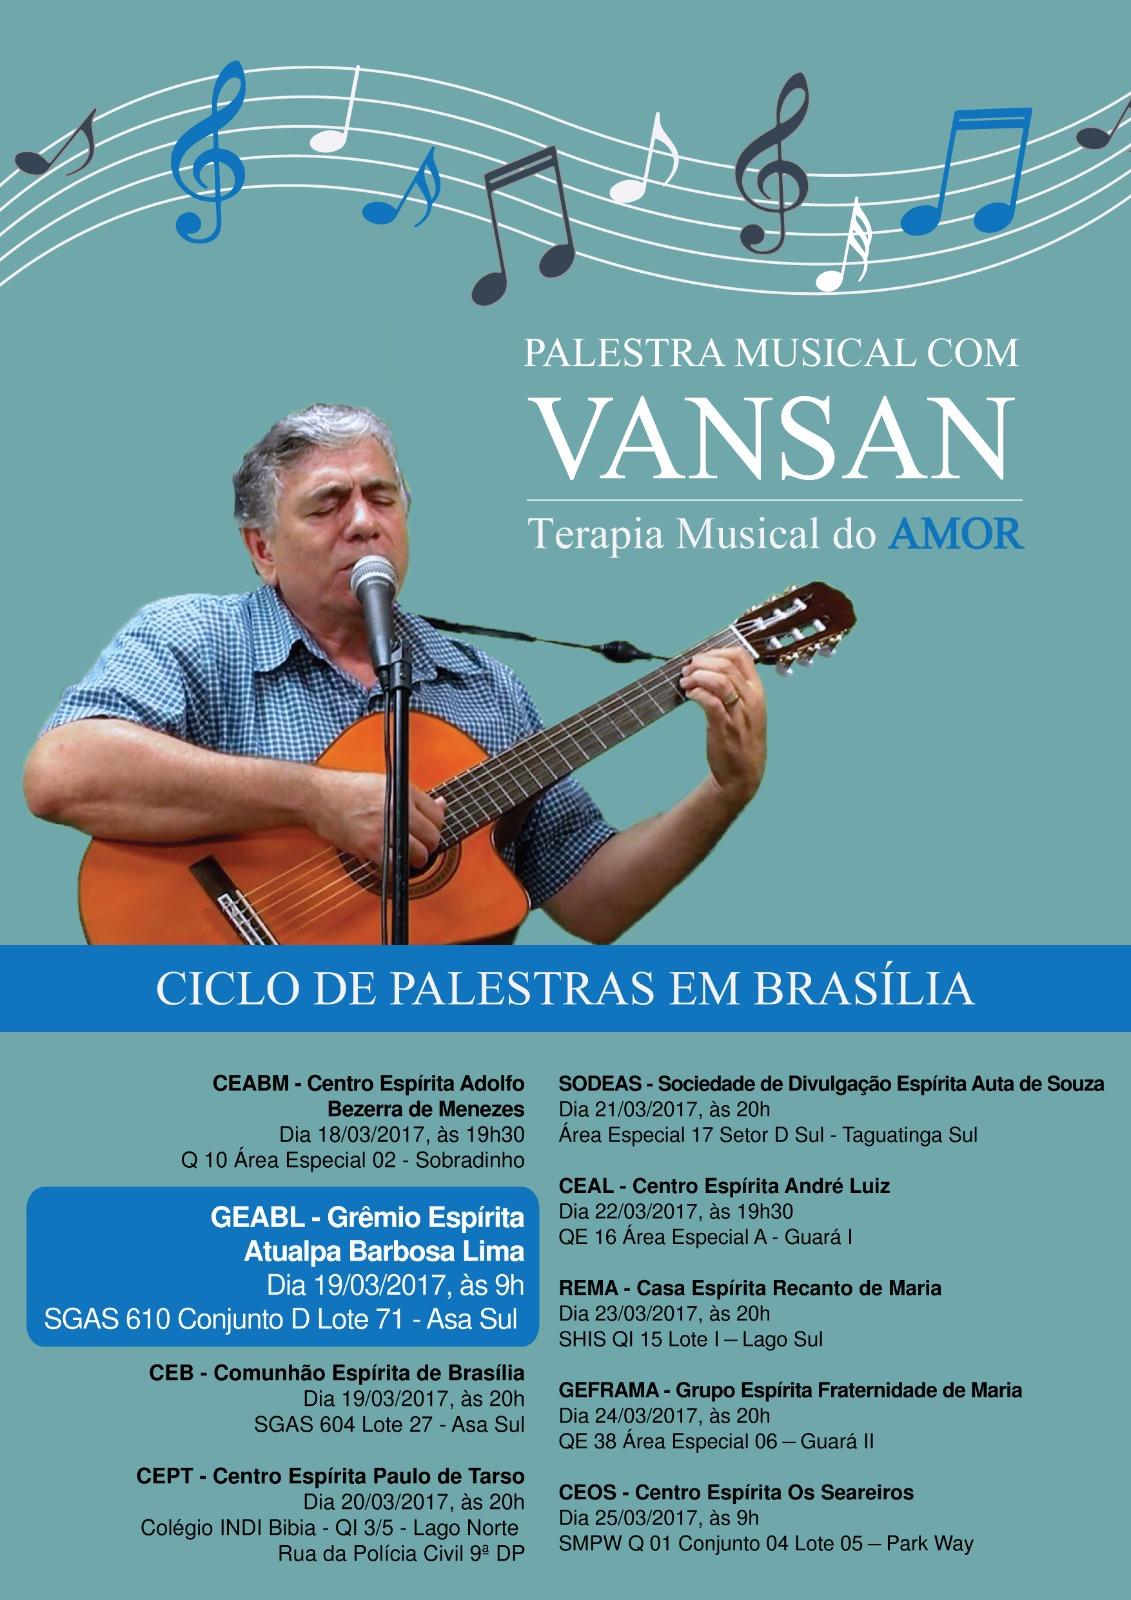 Palestra Musical com Vansan